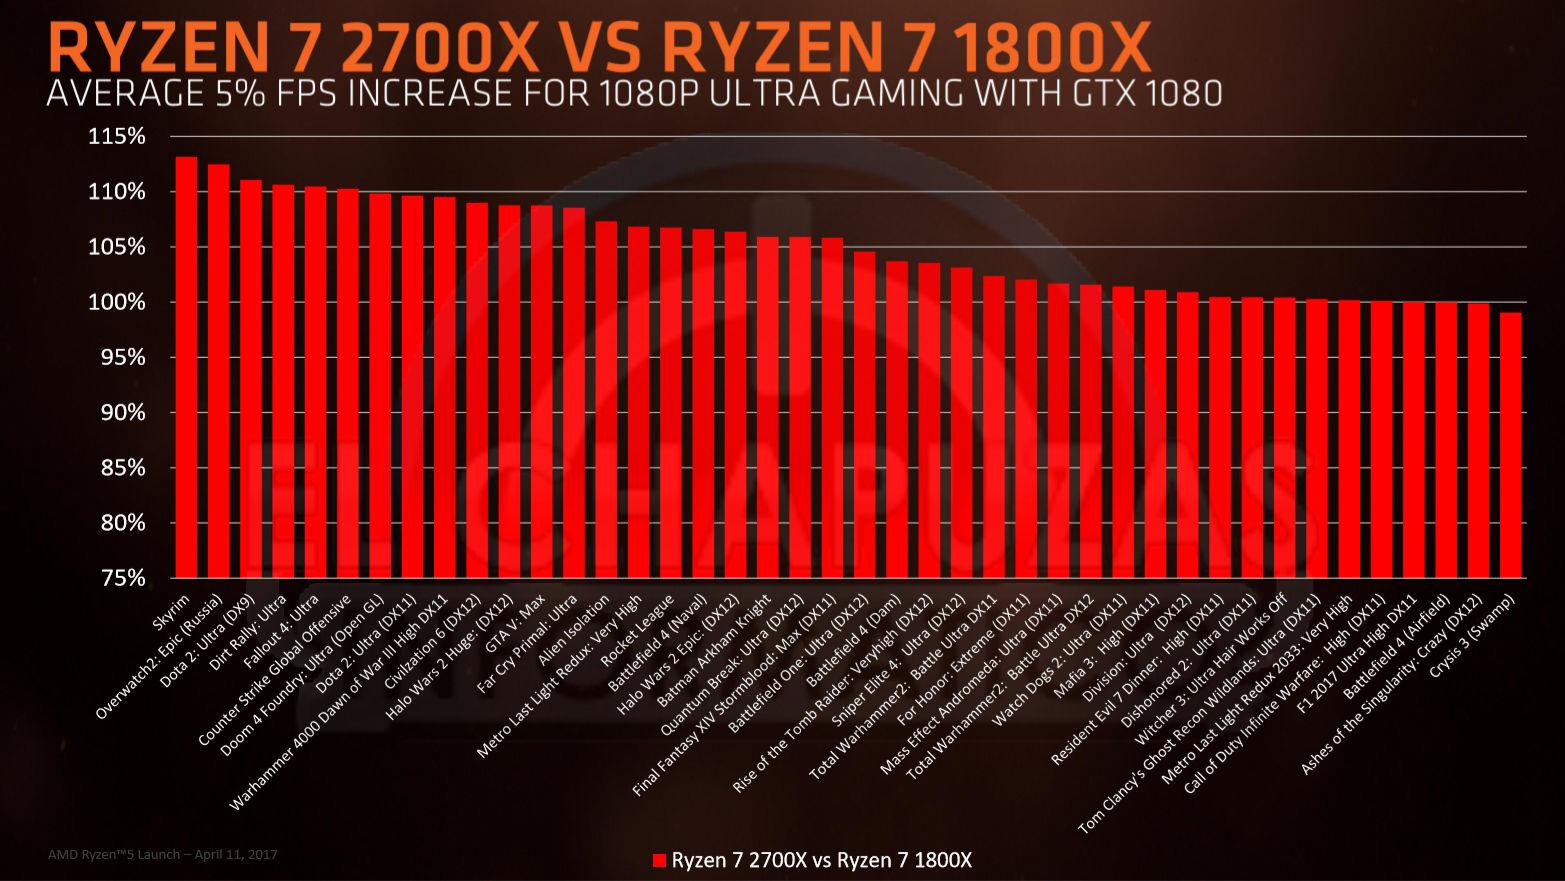 Ryzen 7 2700x vs Ryzen 7 1800X